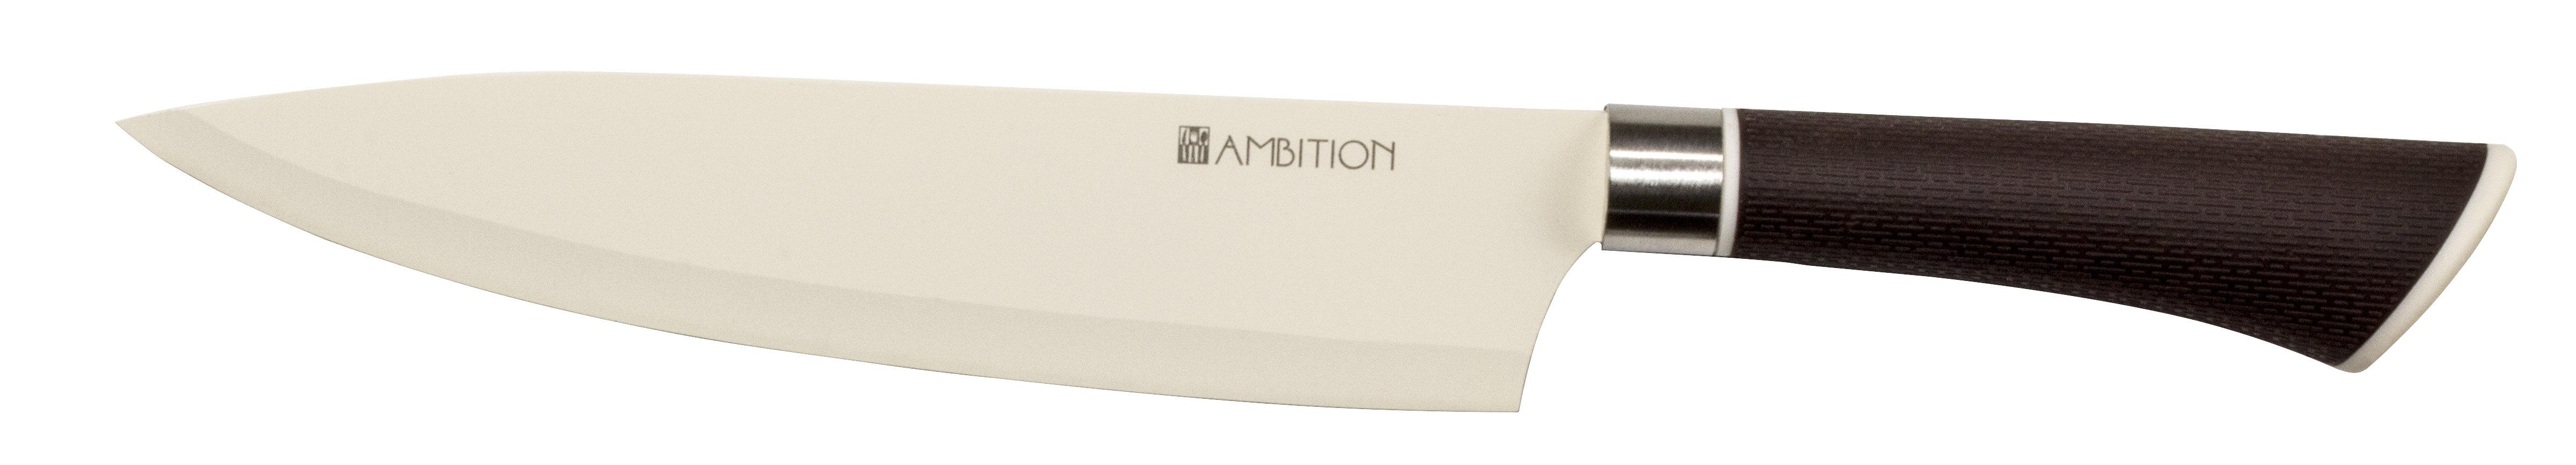 Ambition šefo peilis Pure Line